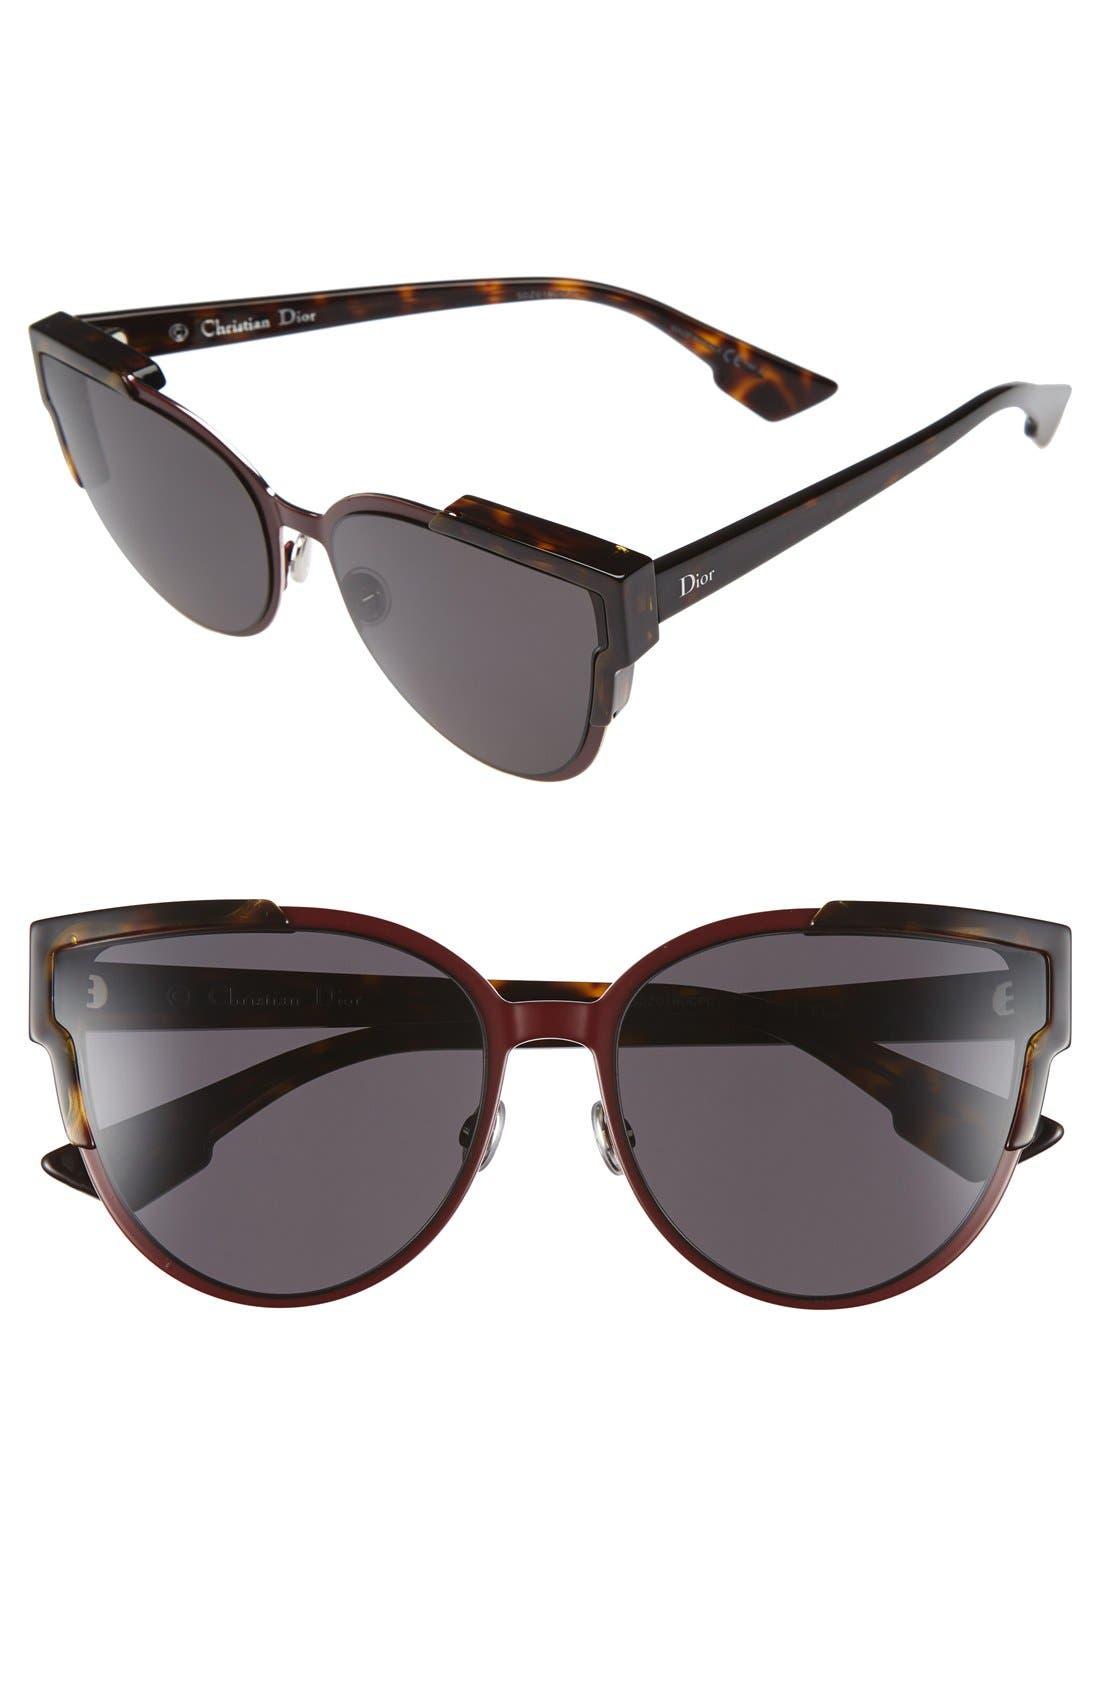 Wildly Dior 60mm Cat Eye Sunglasses,                         Main,                         color, Havana/ Brown/ Green/ Havana